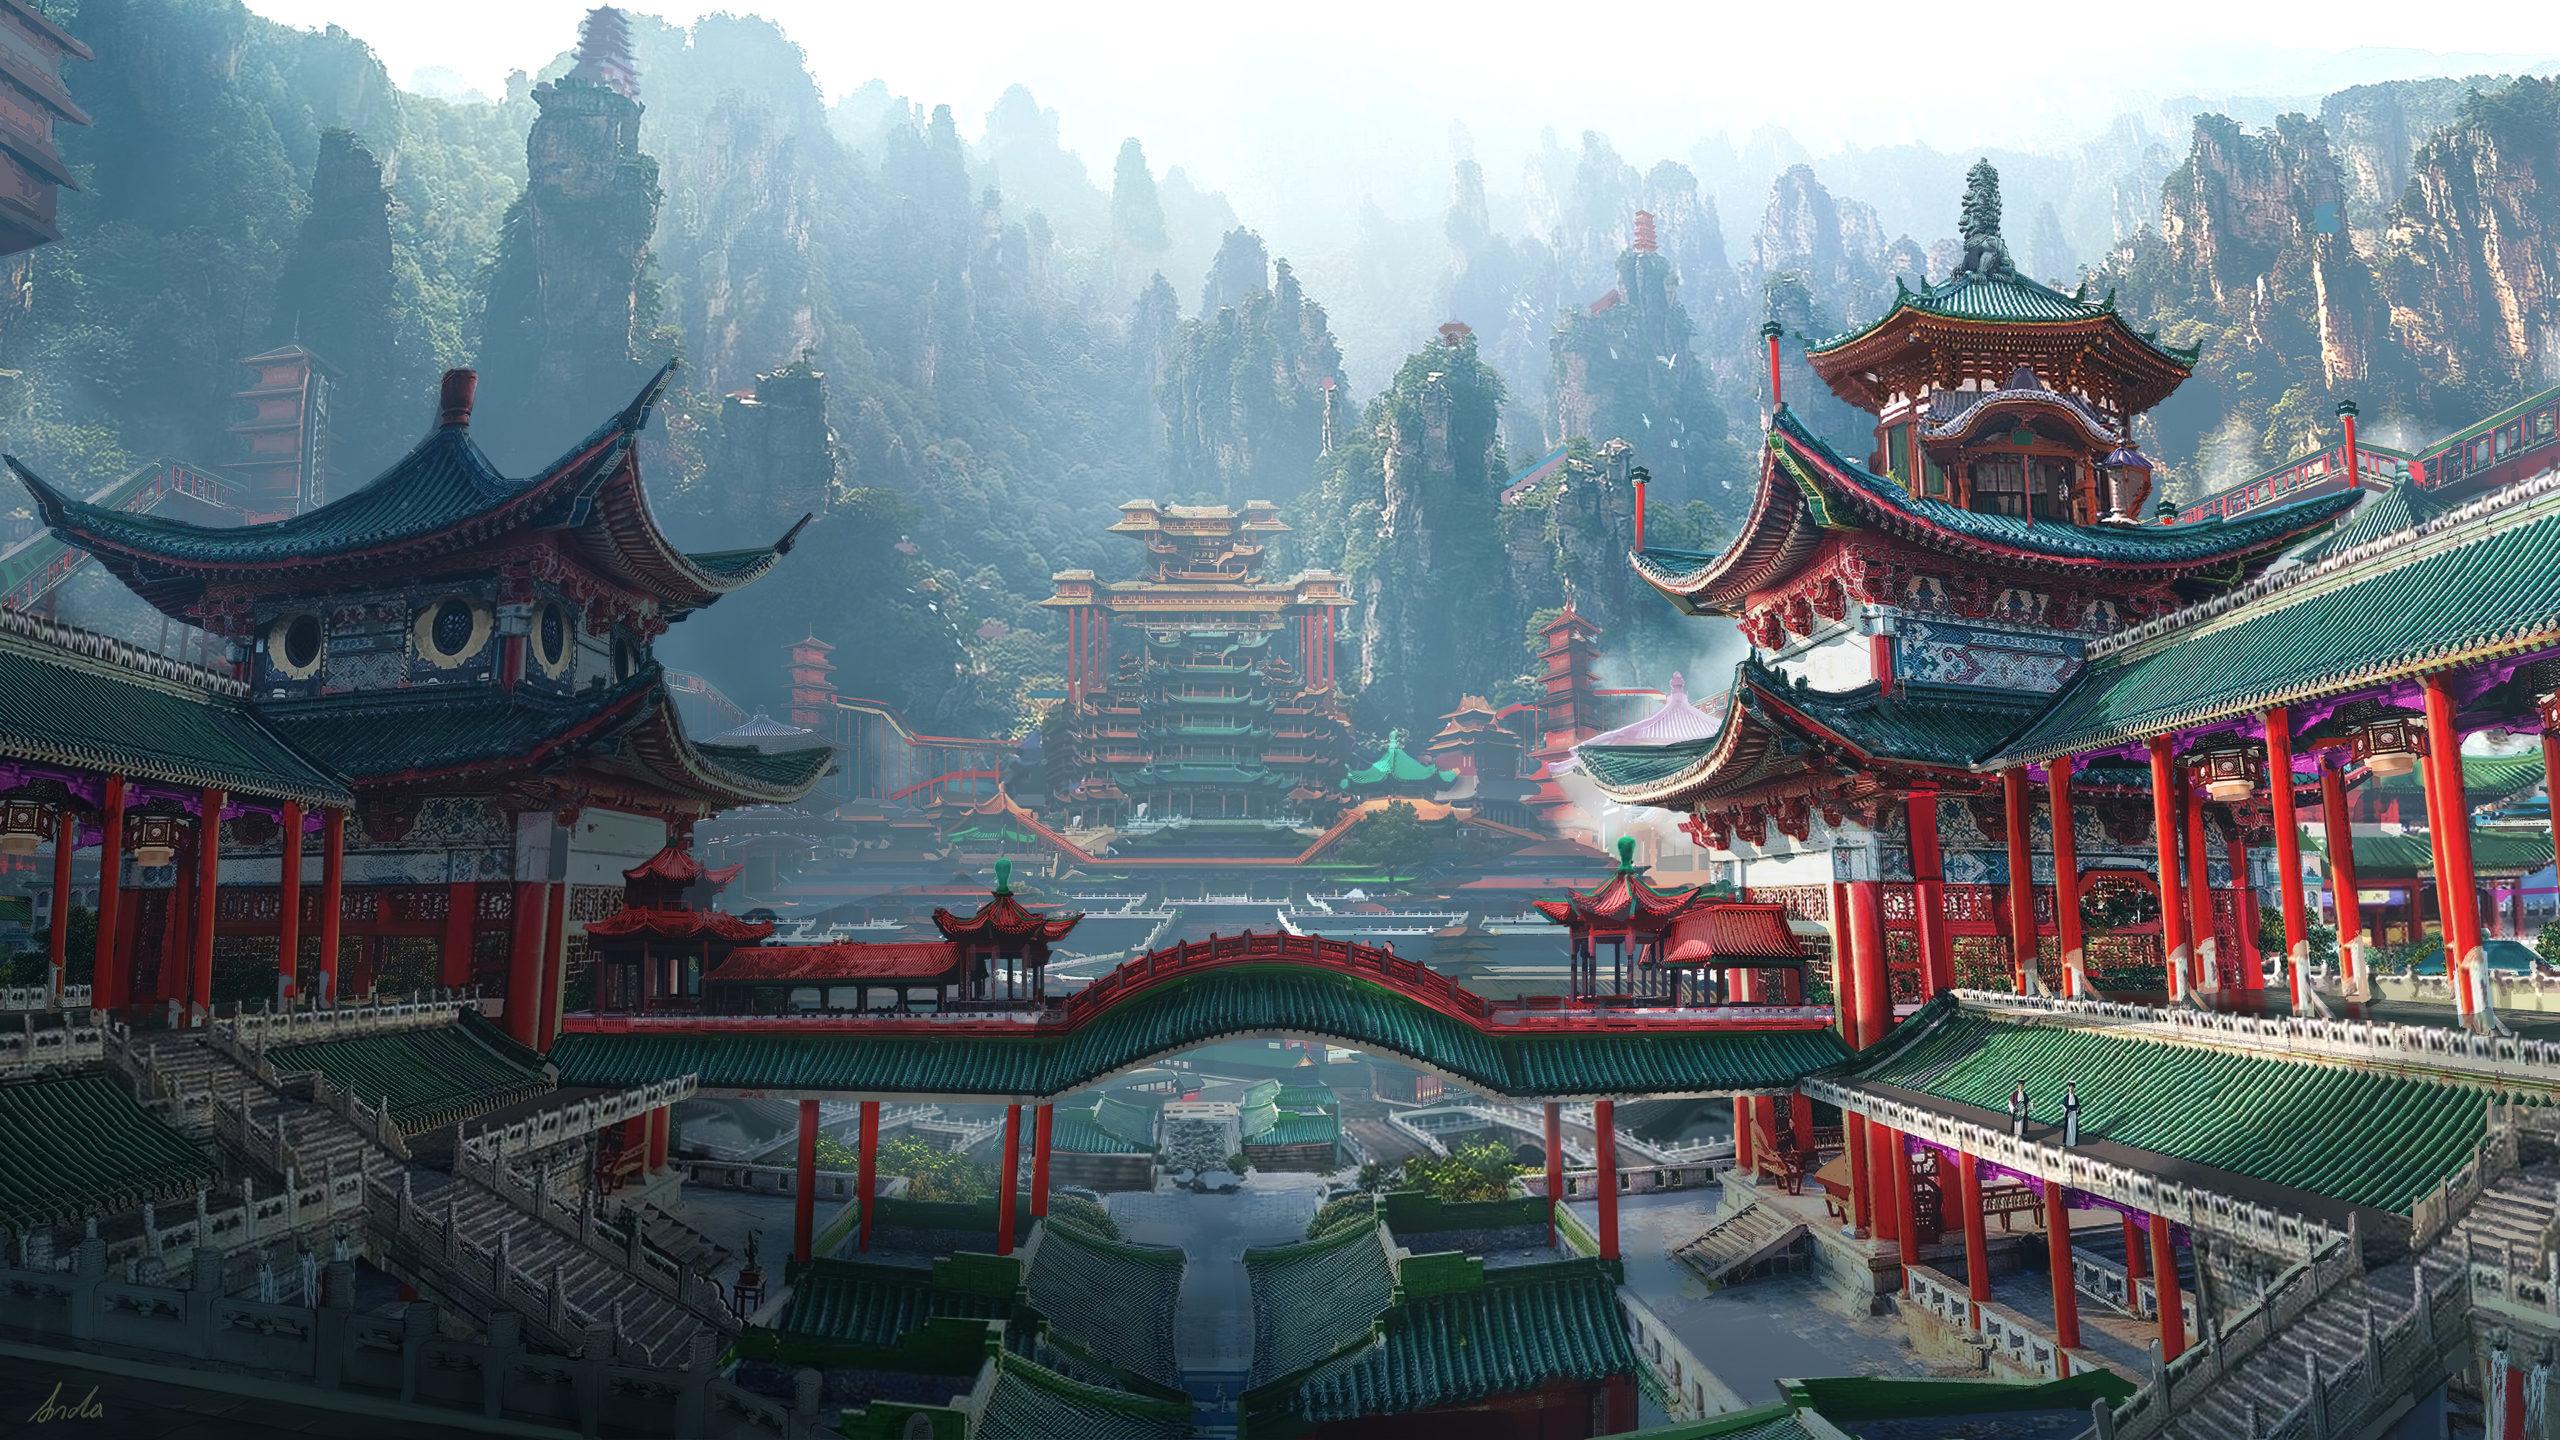 Китайский дворец Китай дворец горы